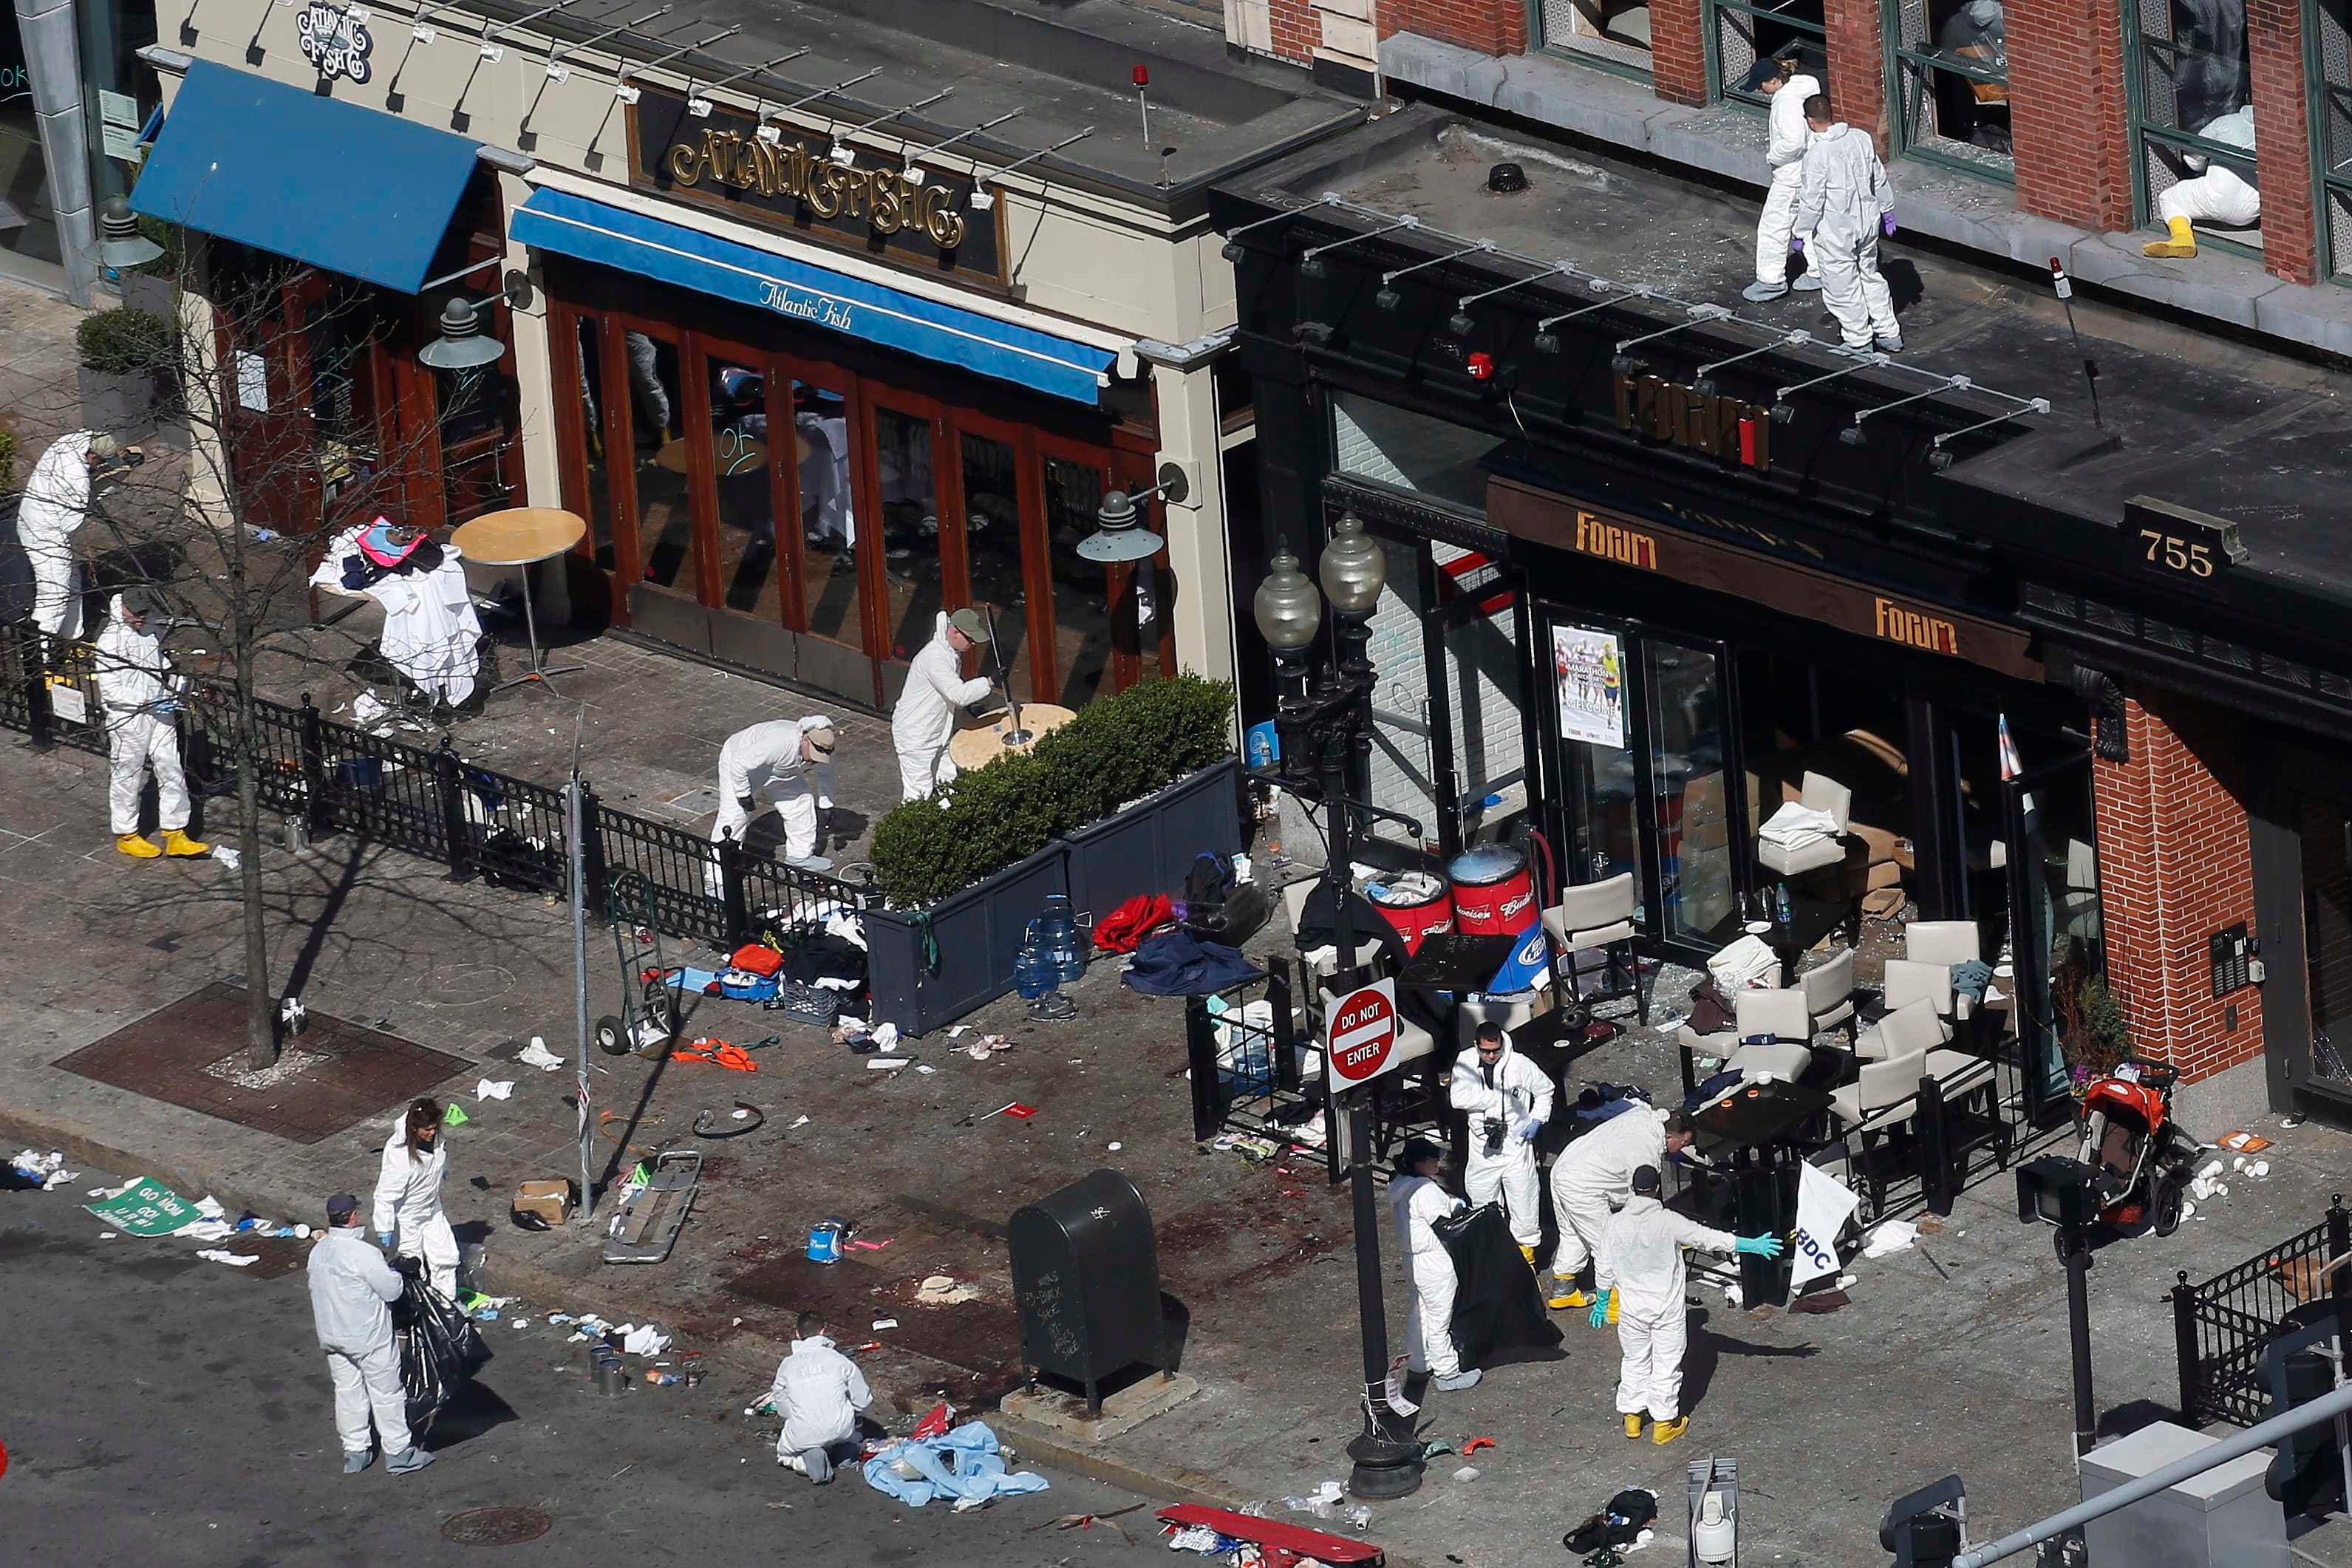 Boston (Reuters)